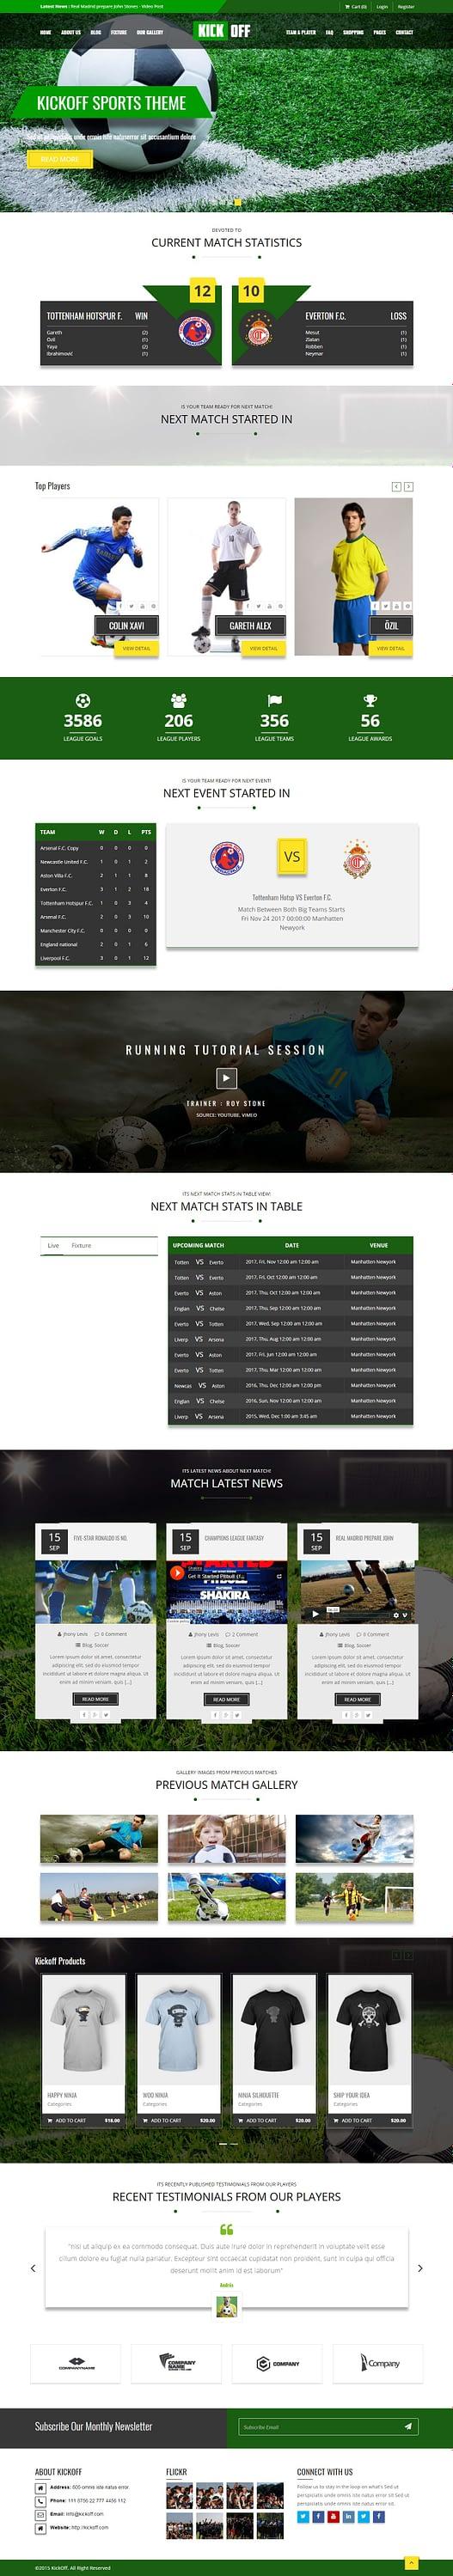 kickoff best premium sports wordpress theme - 10+ Best Premium Sports WordPress Themes